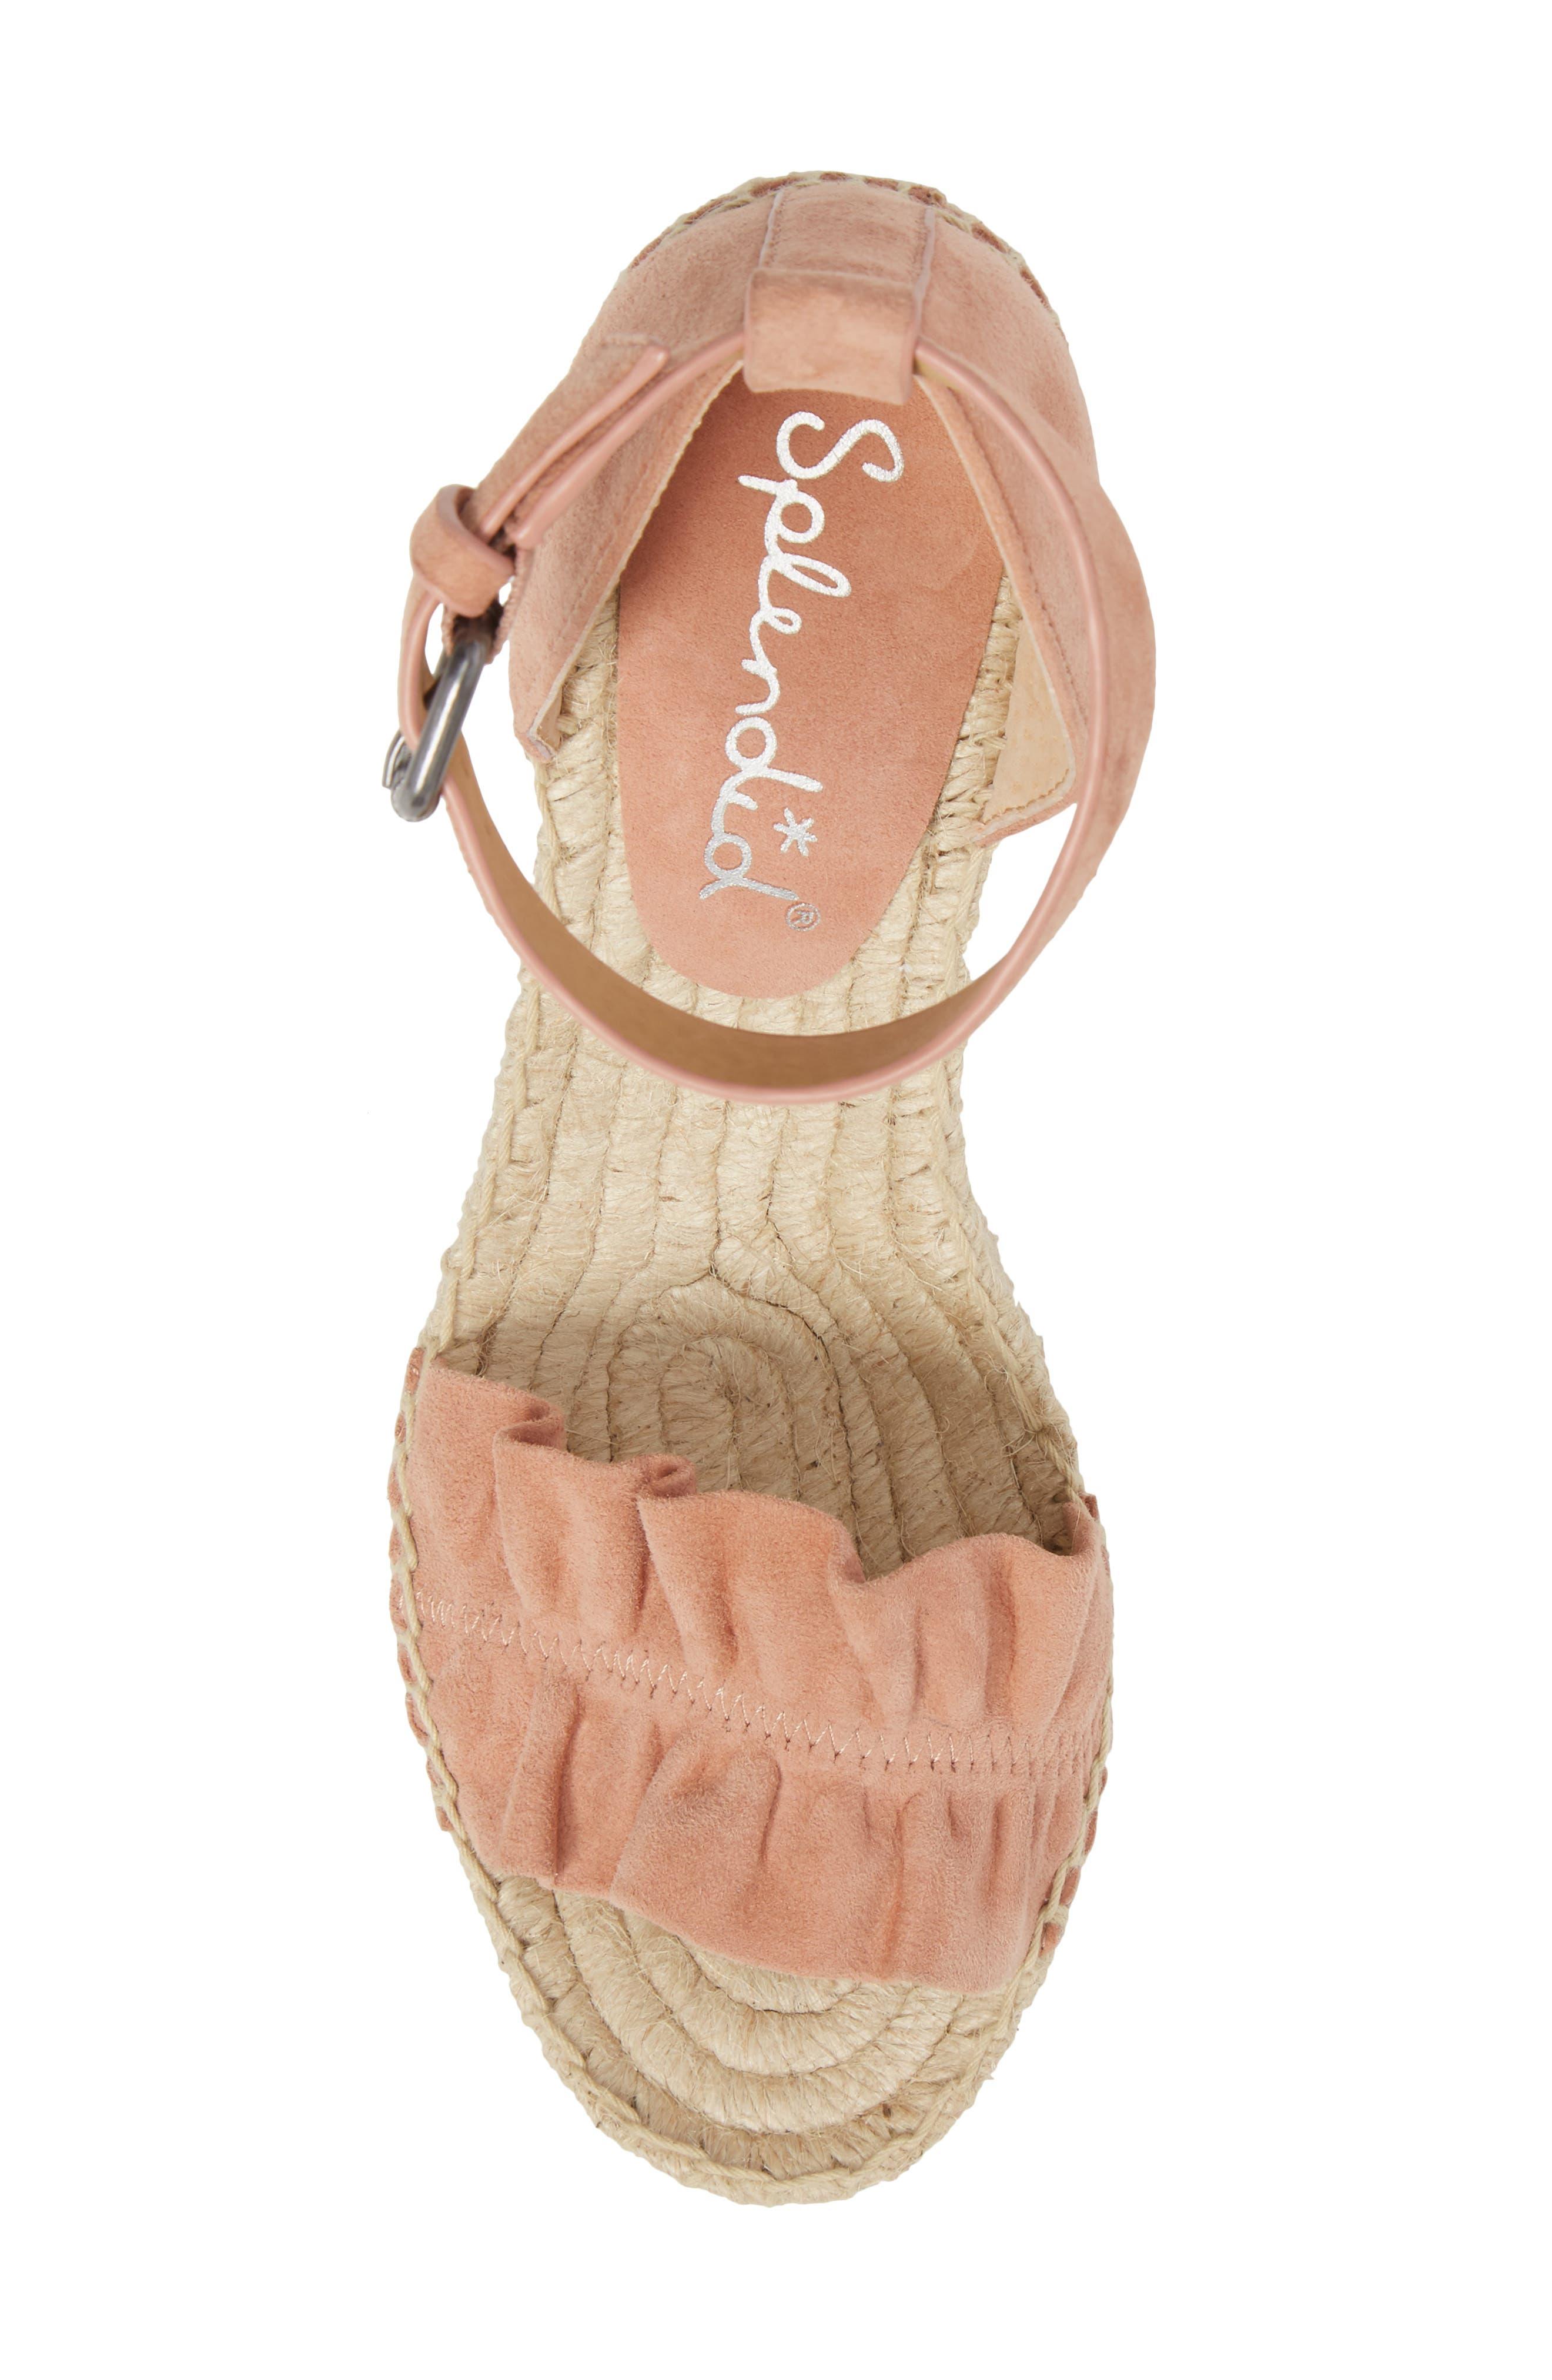 Bedford Espadrille Wedge Sandal,                             Alternate thumbnail 5, color,                             Dark Blush Suede